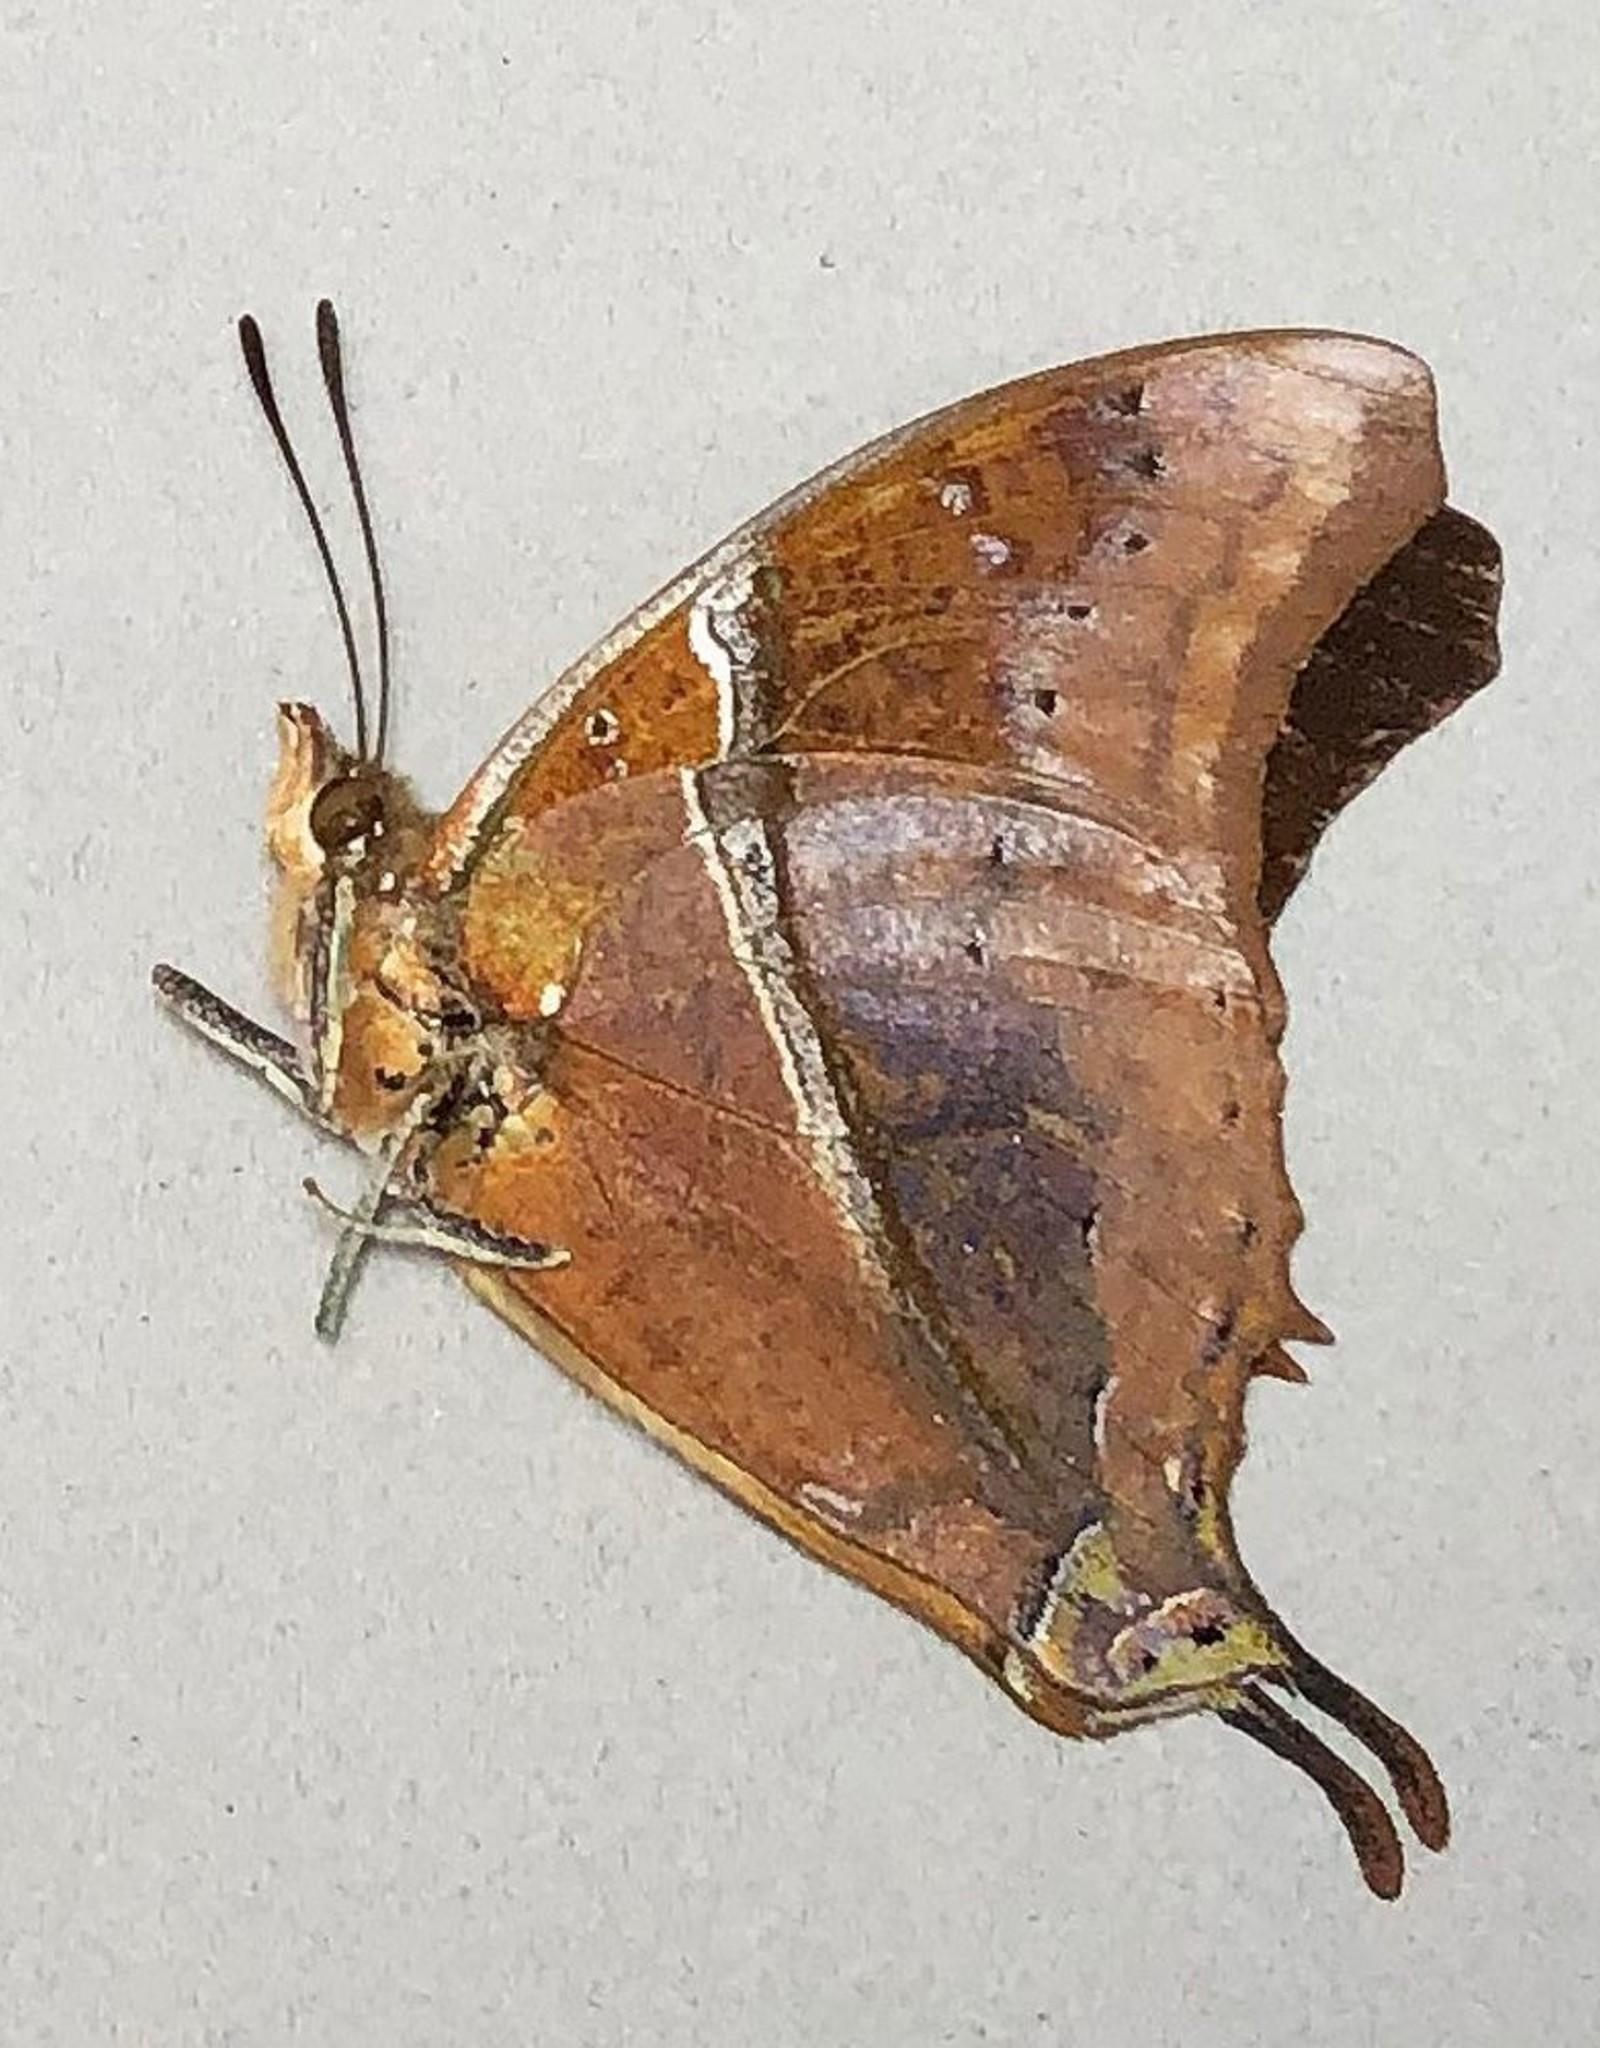 Charaxes betanimena M A1 Madagascar